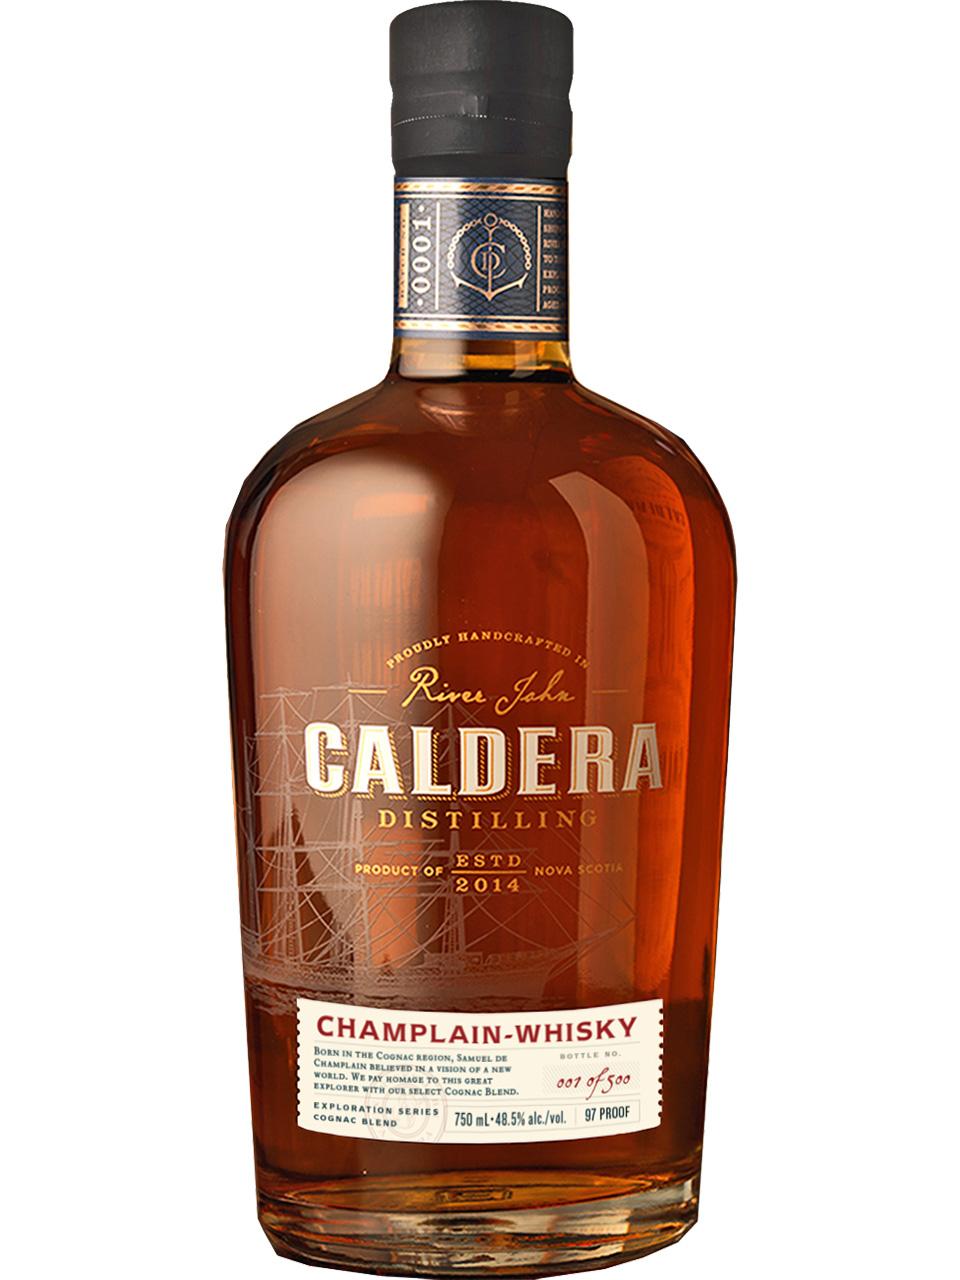 Caldera Champlain Whisky